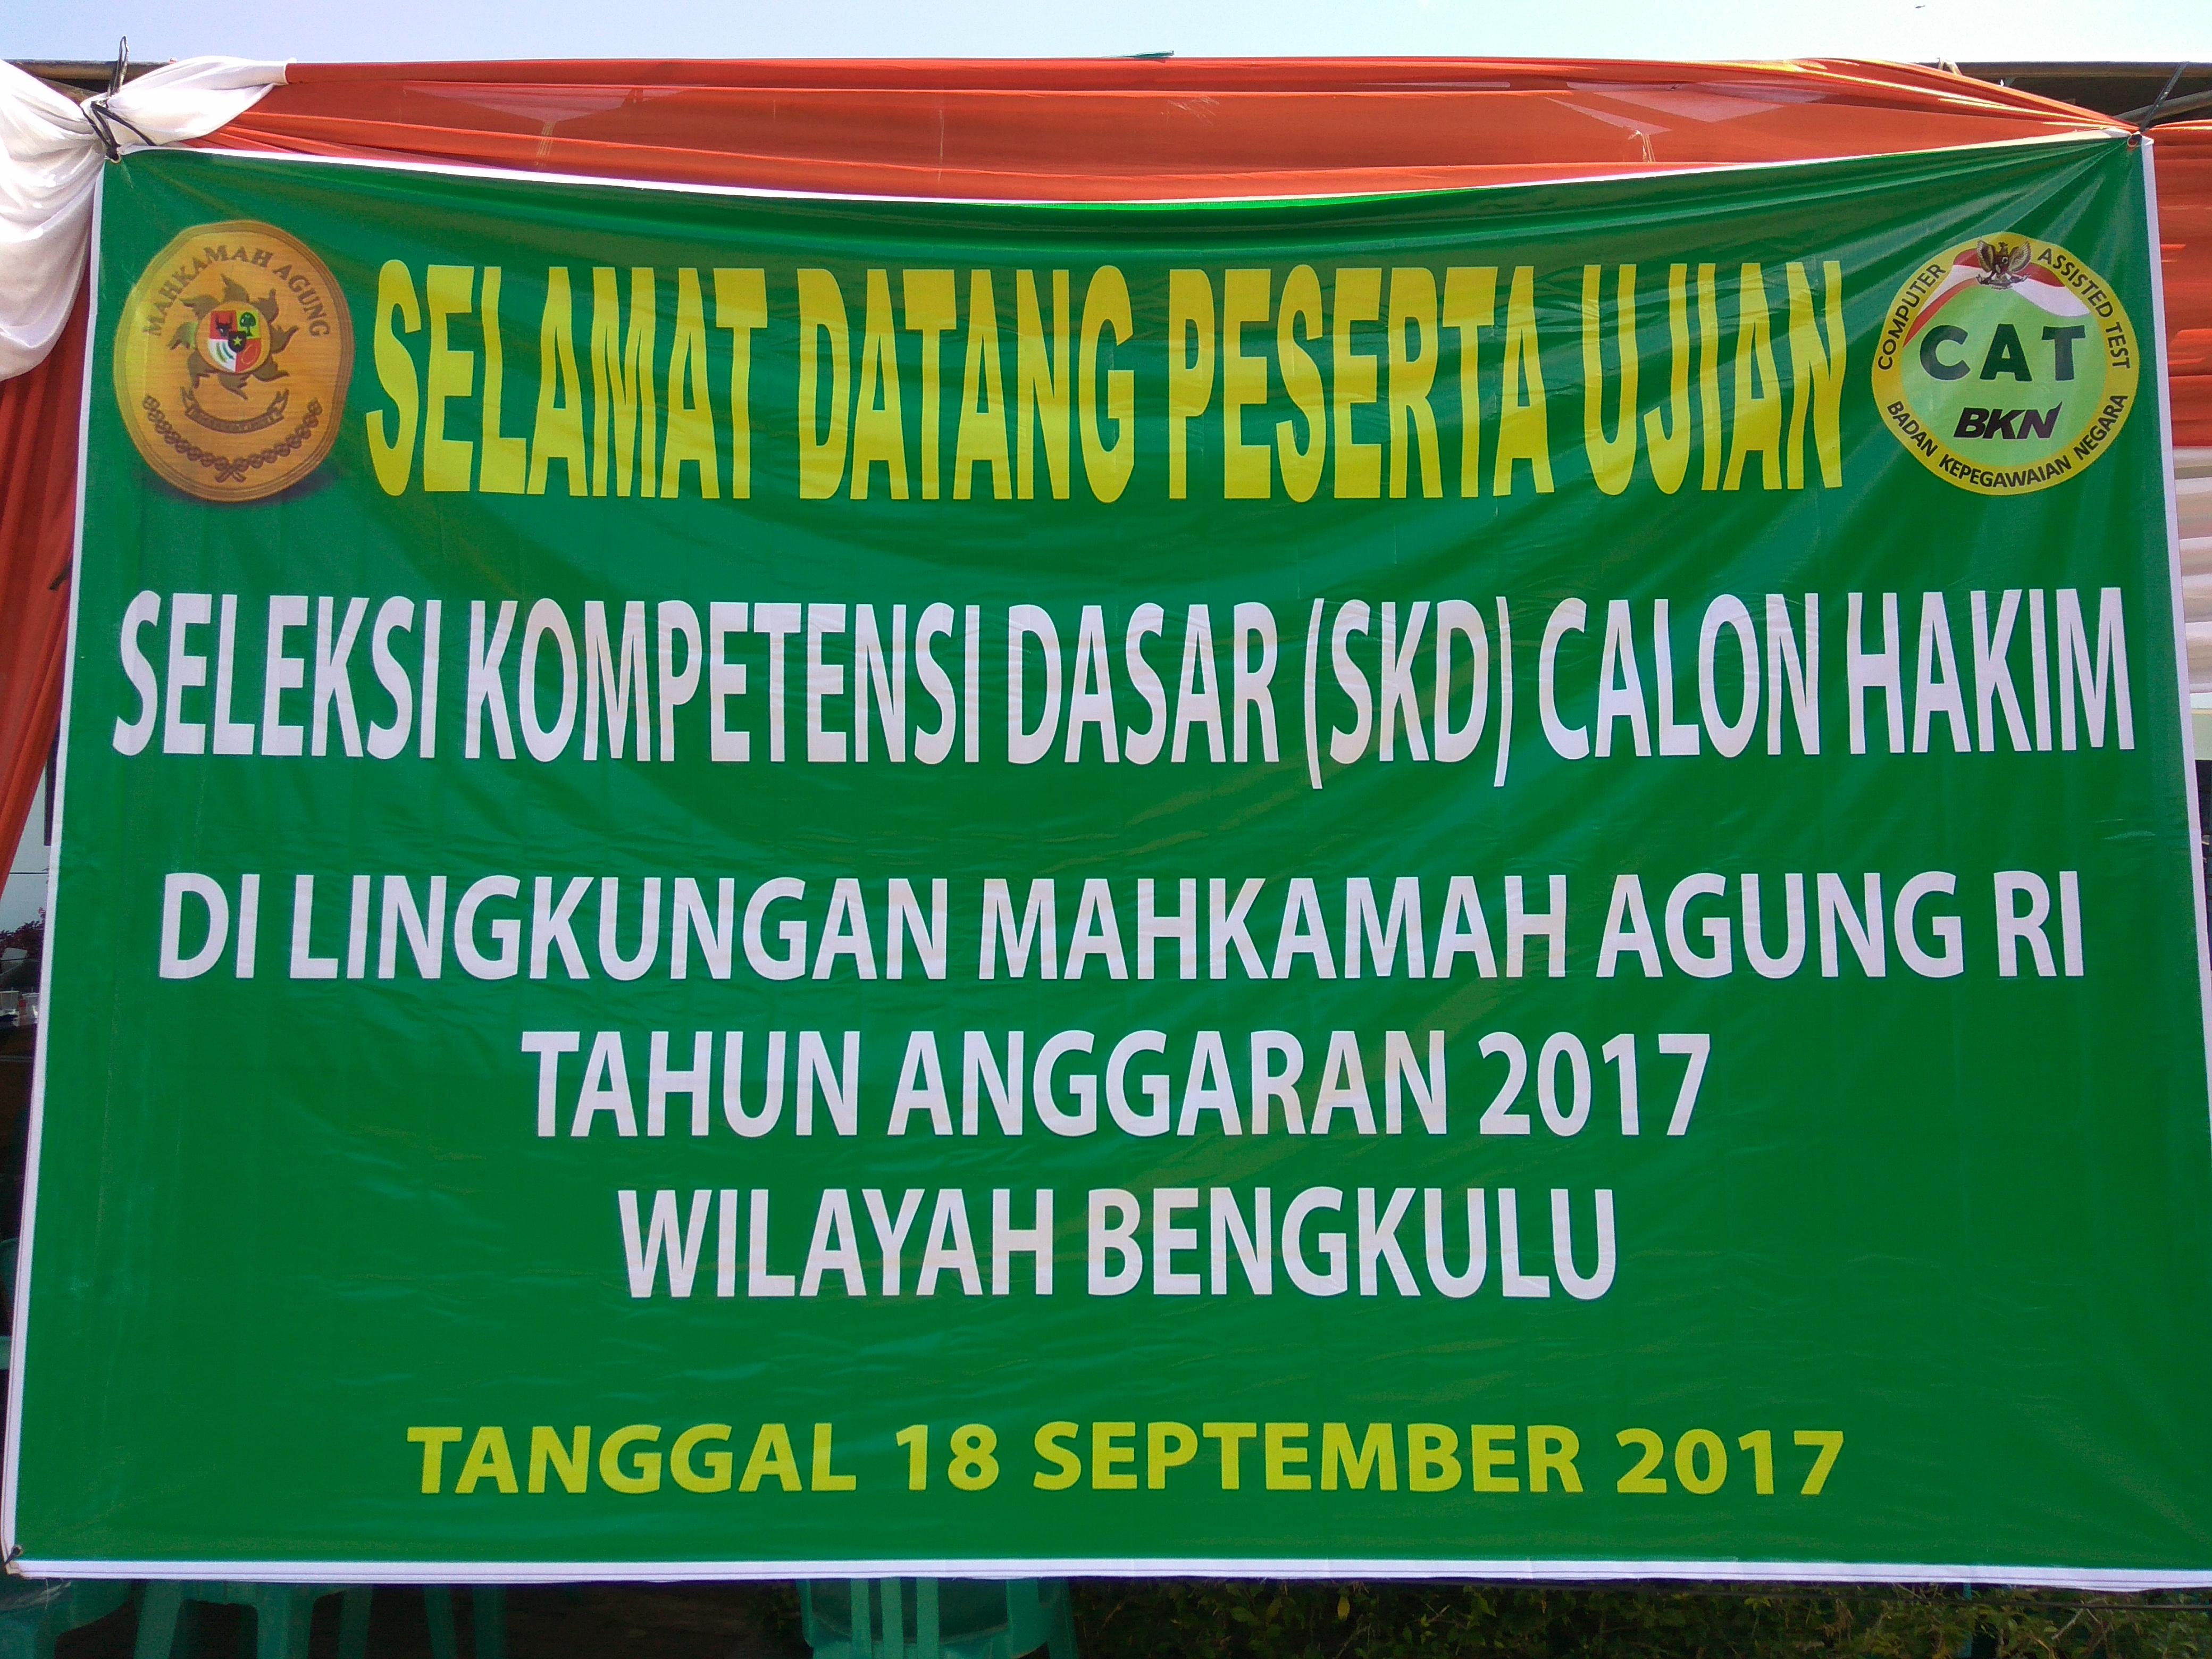 Pelaksanaan Seleksi Kompetensi Dasar Calon Hakim Mahkamah Agung RI Tahun Anggaran 2017